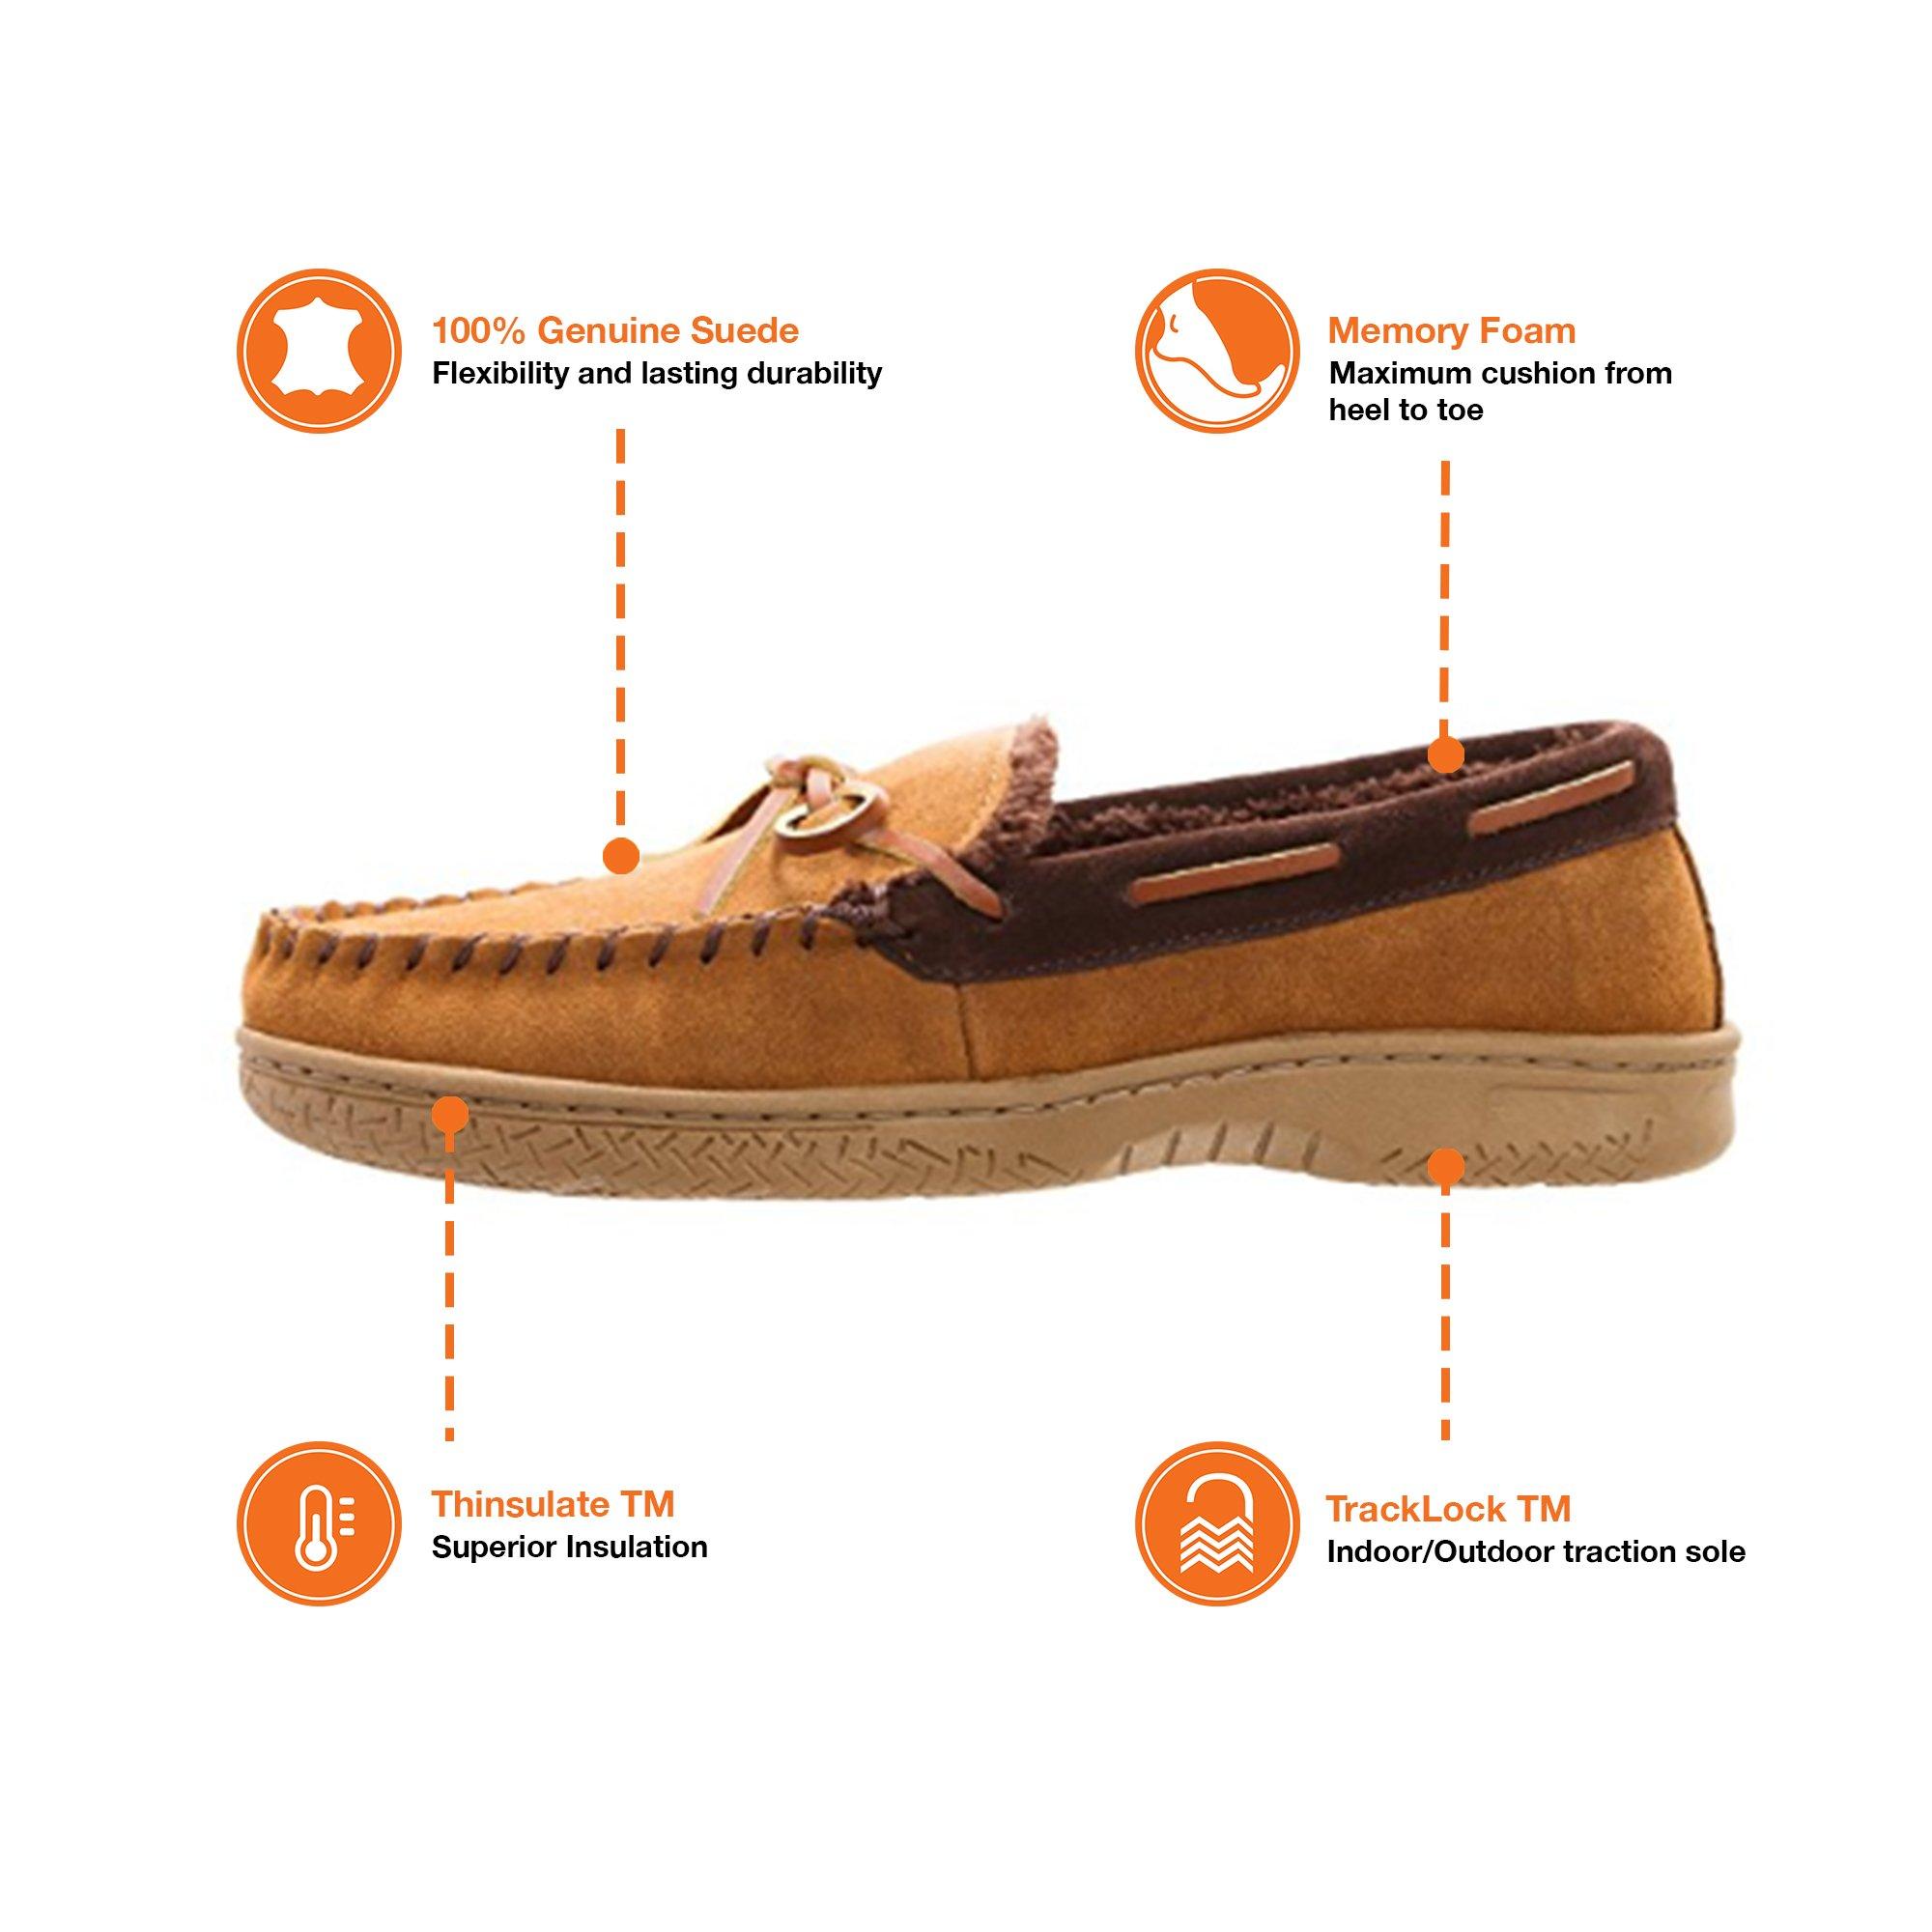 Heat Edge Mens Memory Foam Suede Slip on Indoor/Outdoor Moccasin Slipper Shoe (11, Tan) by Heat Edge (Image #5)